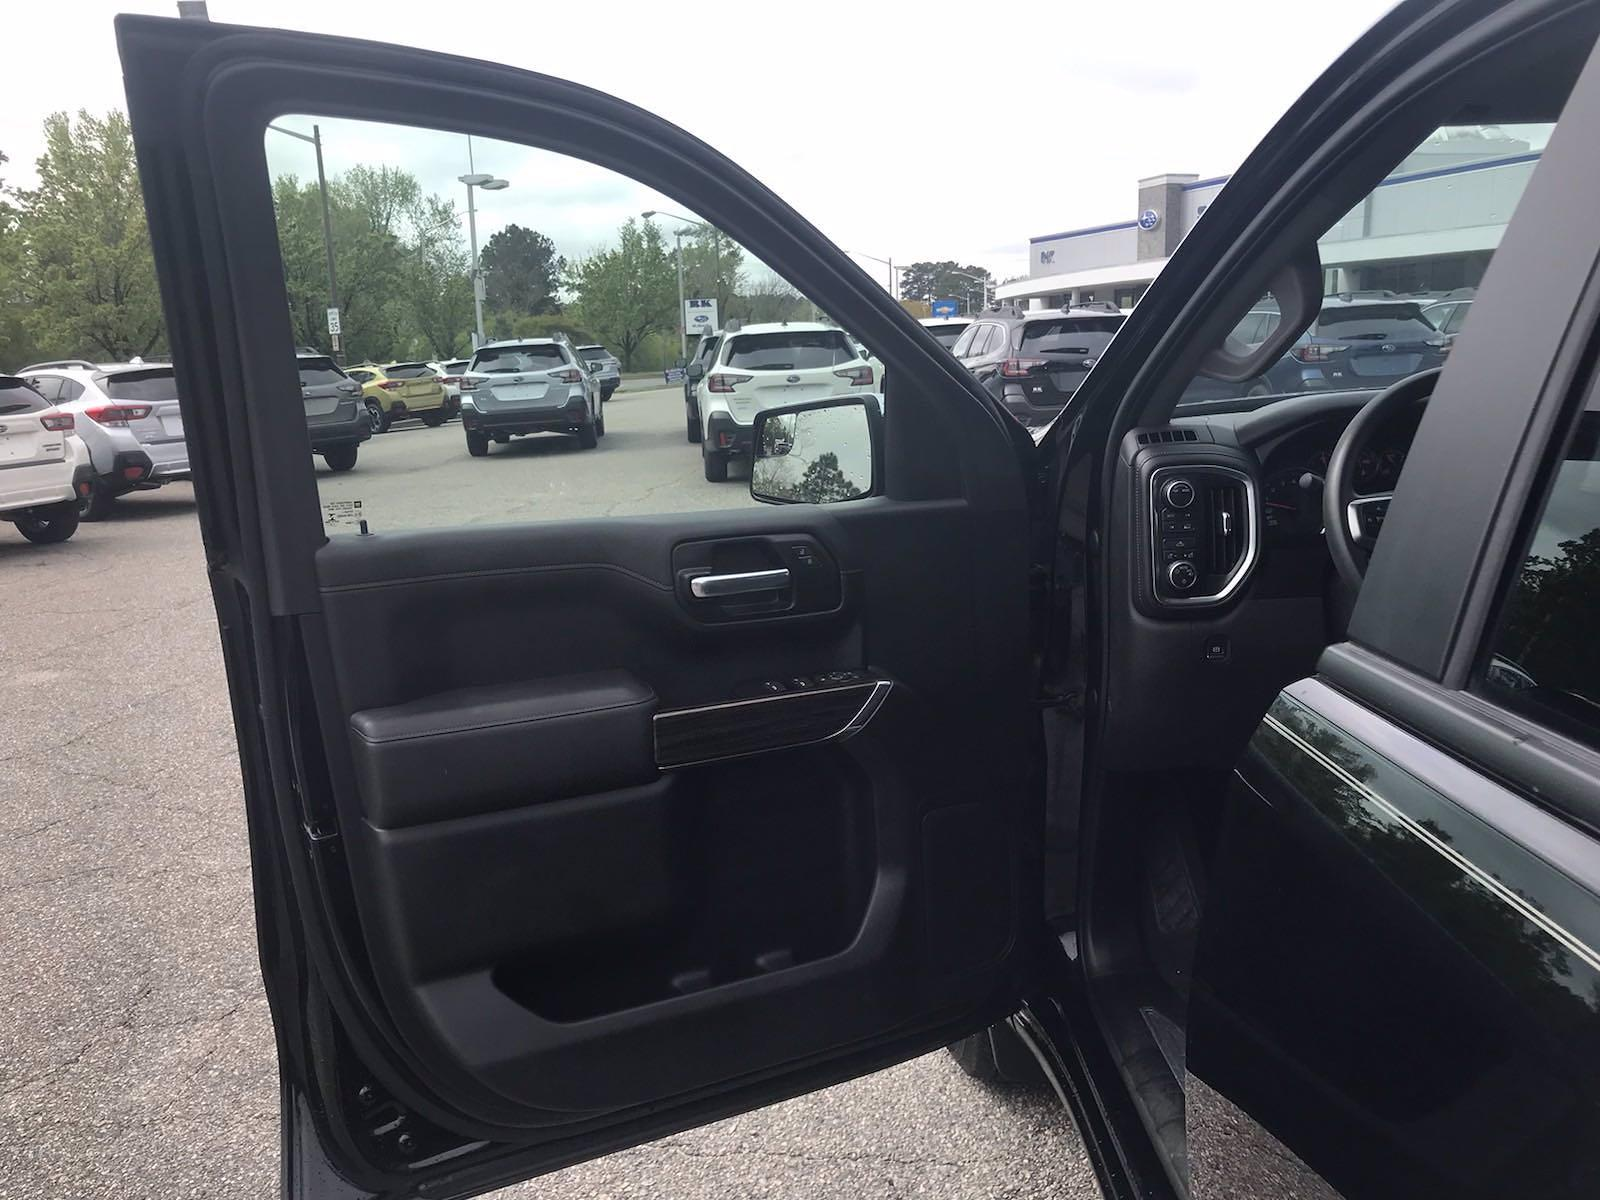 2020 Chevrolet Silverado 1500 Crew Cab 4x4, Pickup #16458PN - photo 22